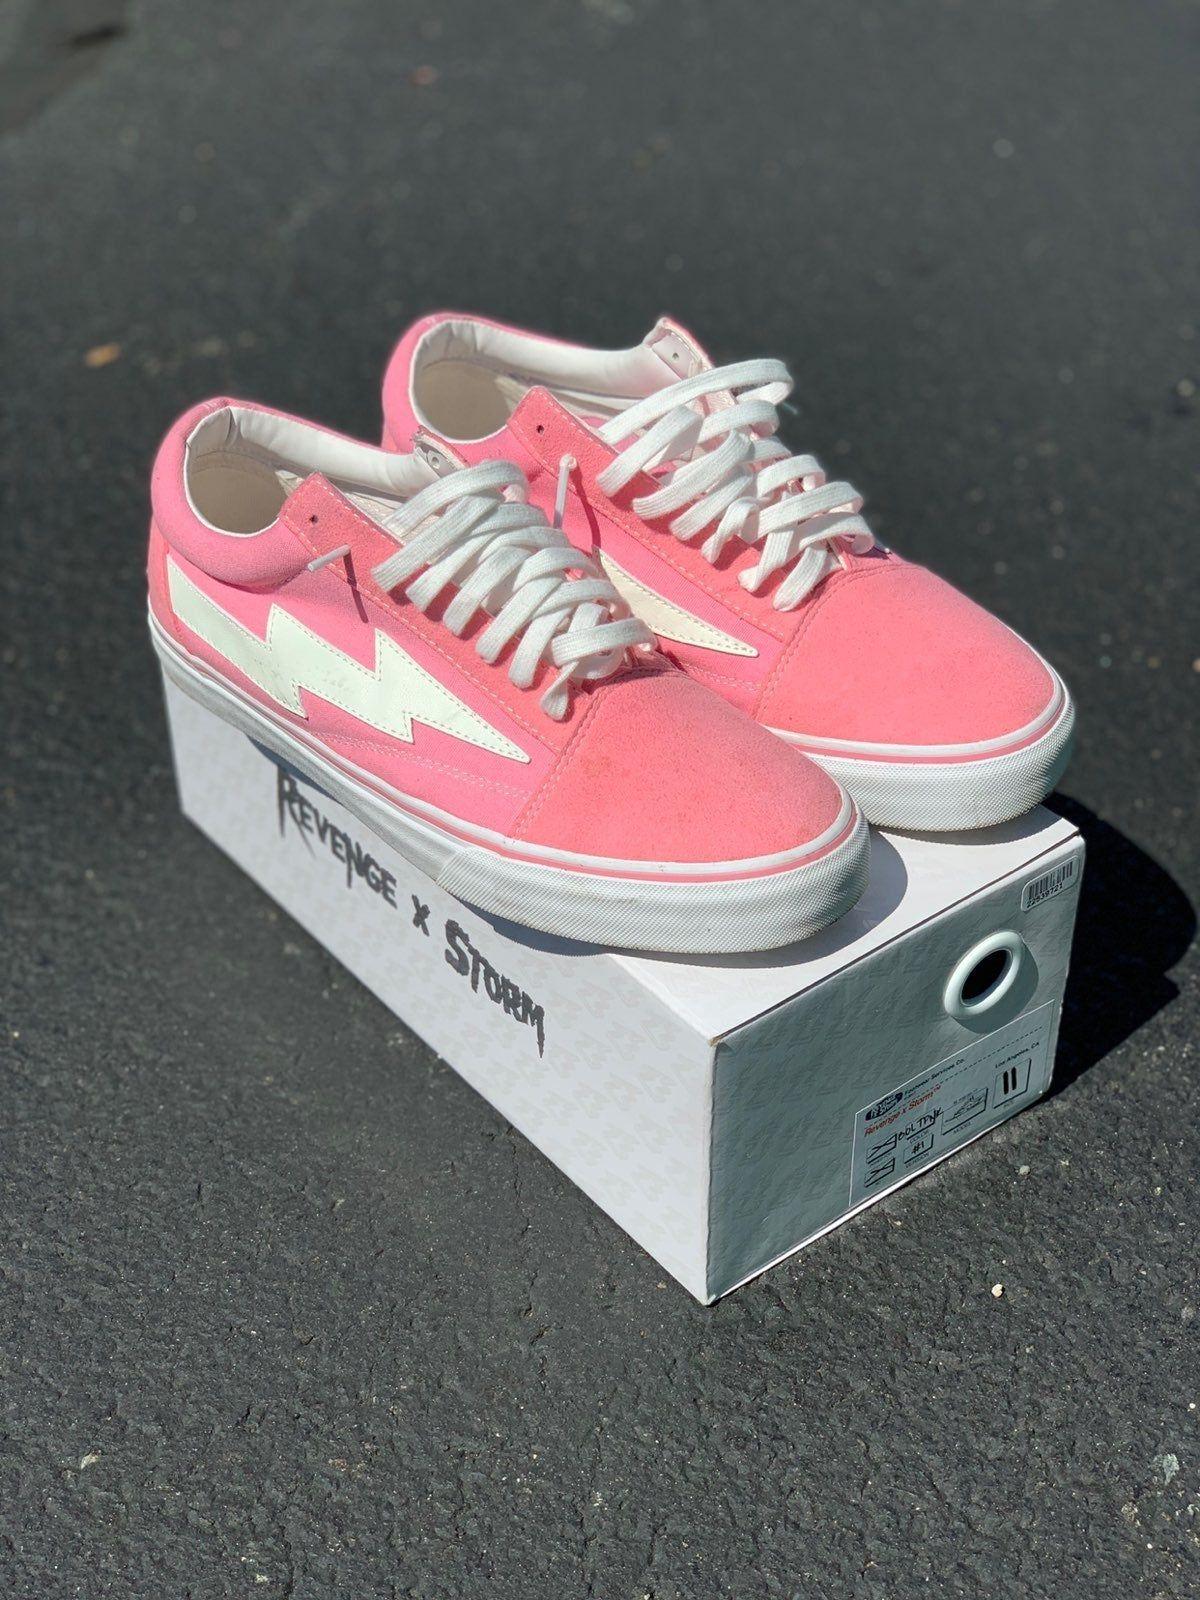 Revenge x storm bolt pink Size 11 100